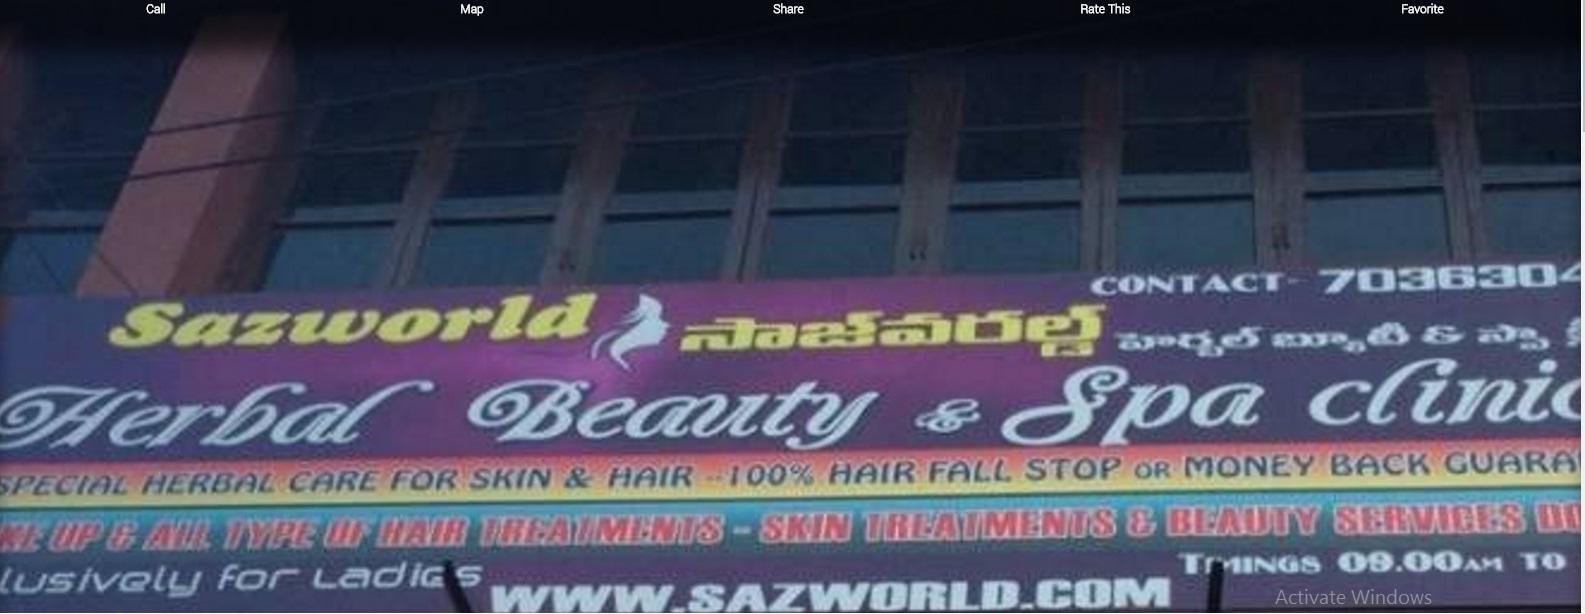 sazworld Herbal Beauty Clinic